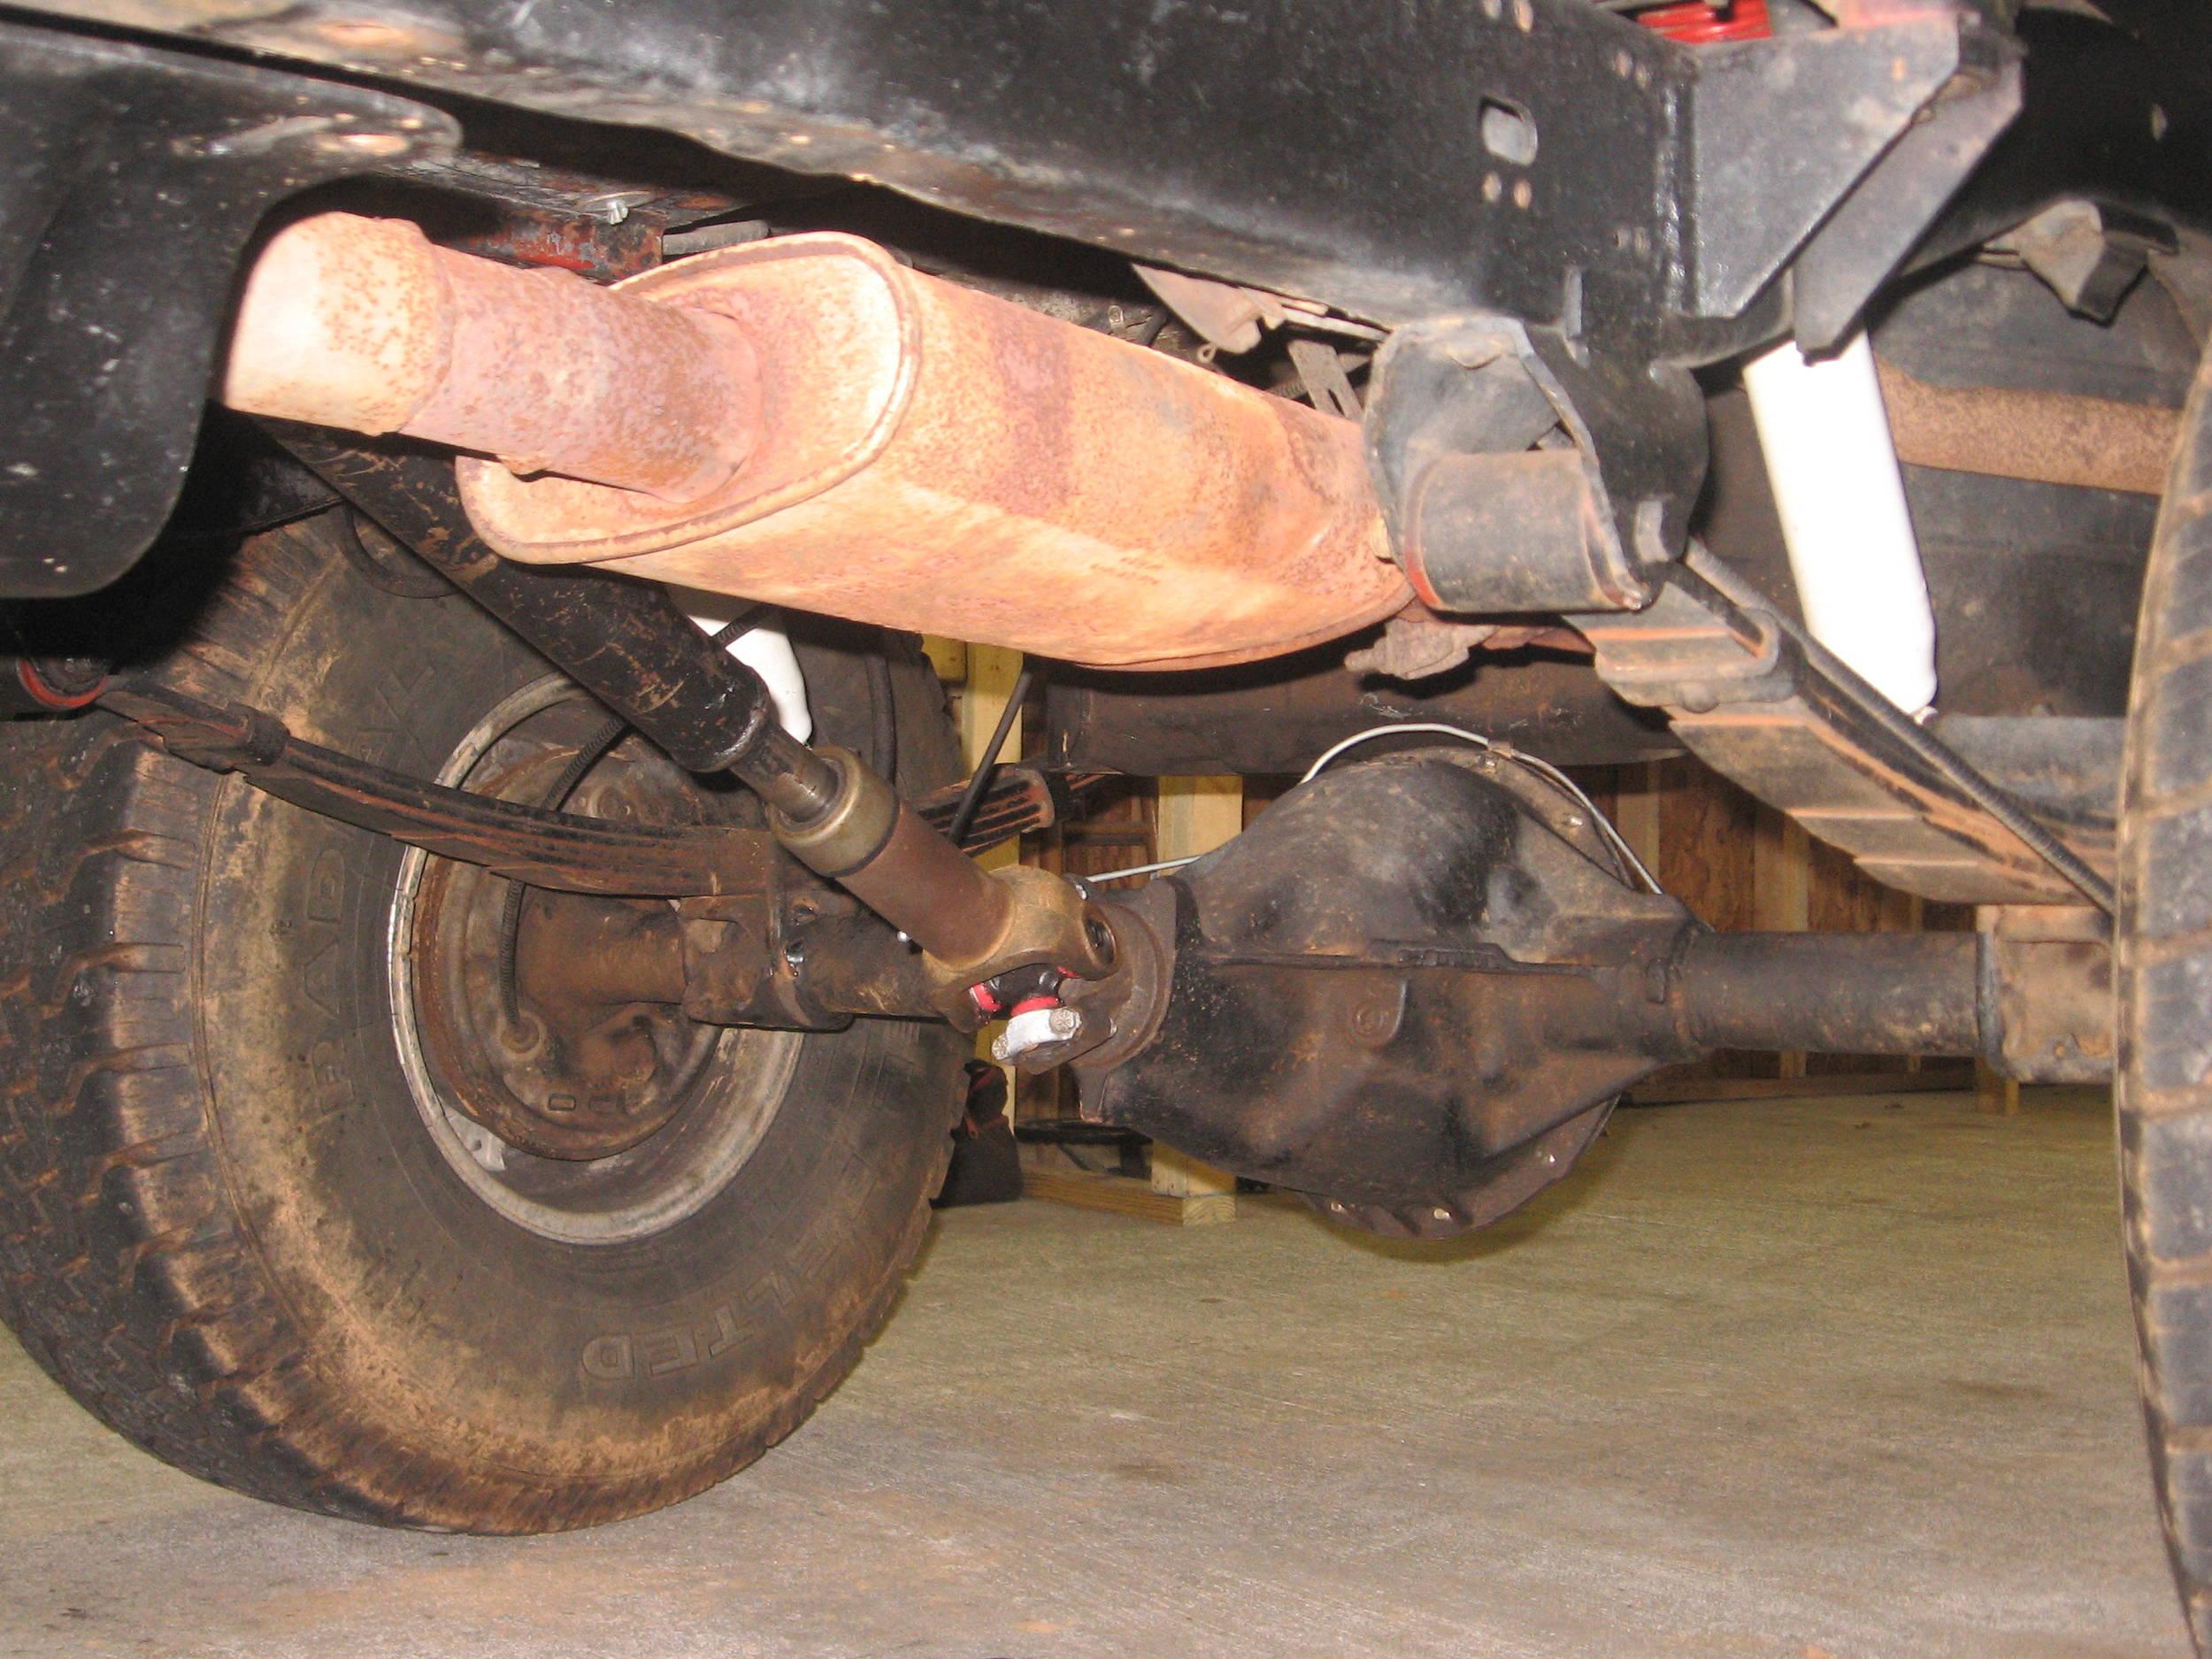 Jeep_Rebuild_12-5-11_013.jpg